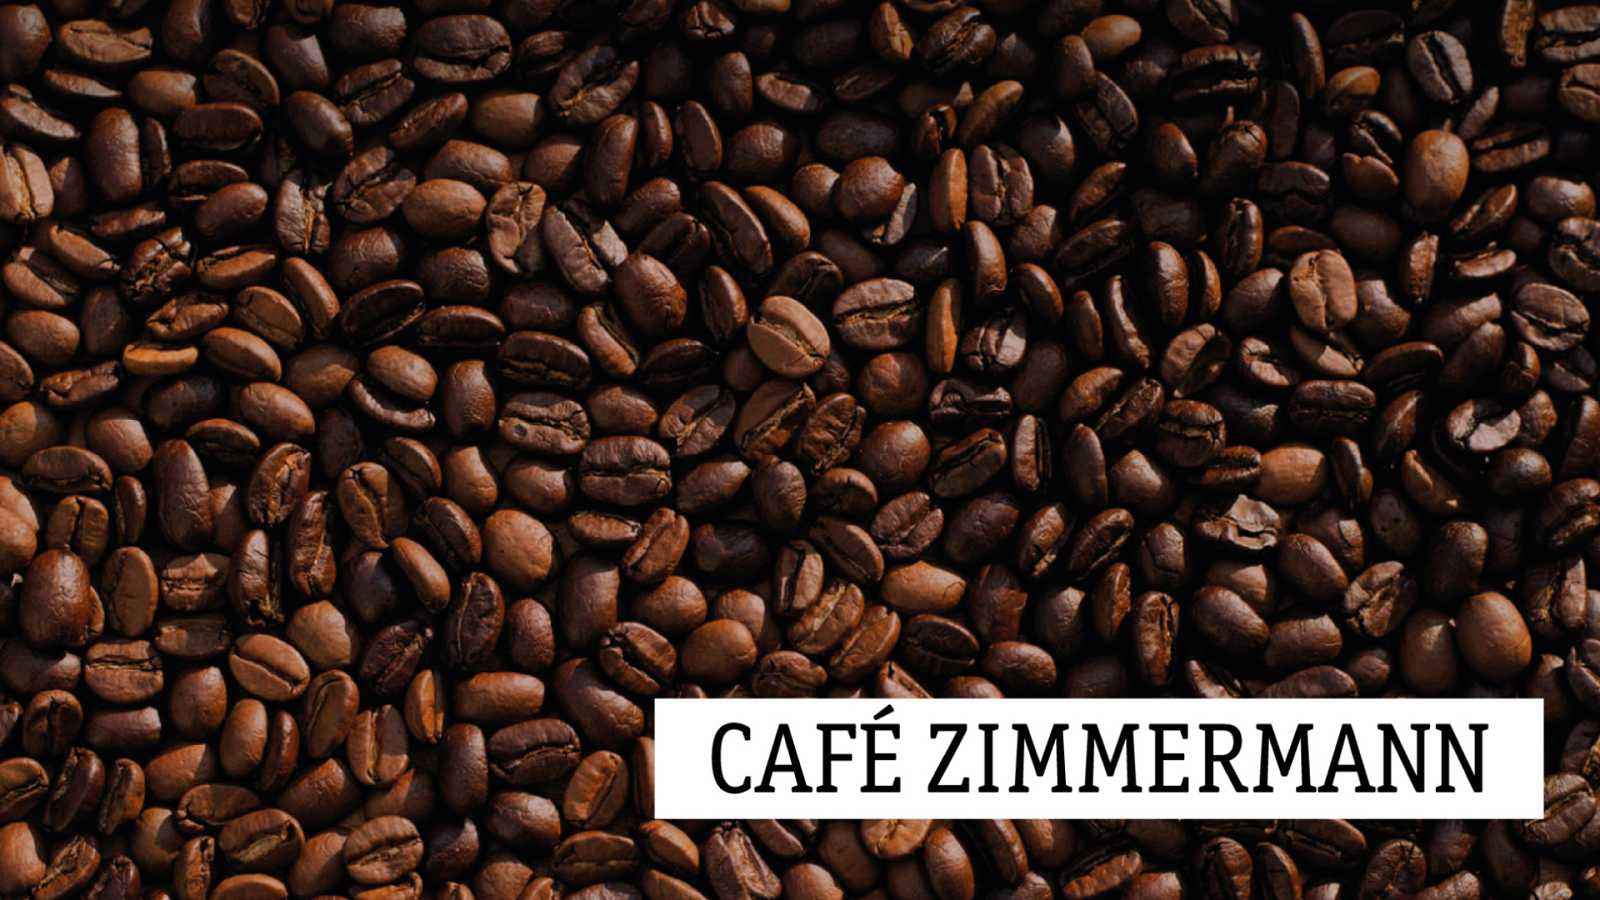 Café Zimmermann - Glinka en Italia - 19/04/21 - escuchar ahora